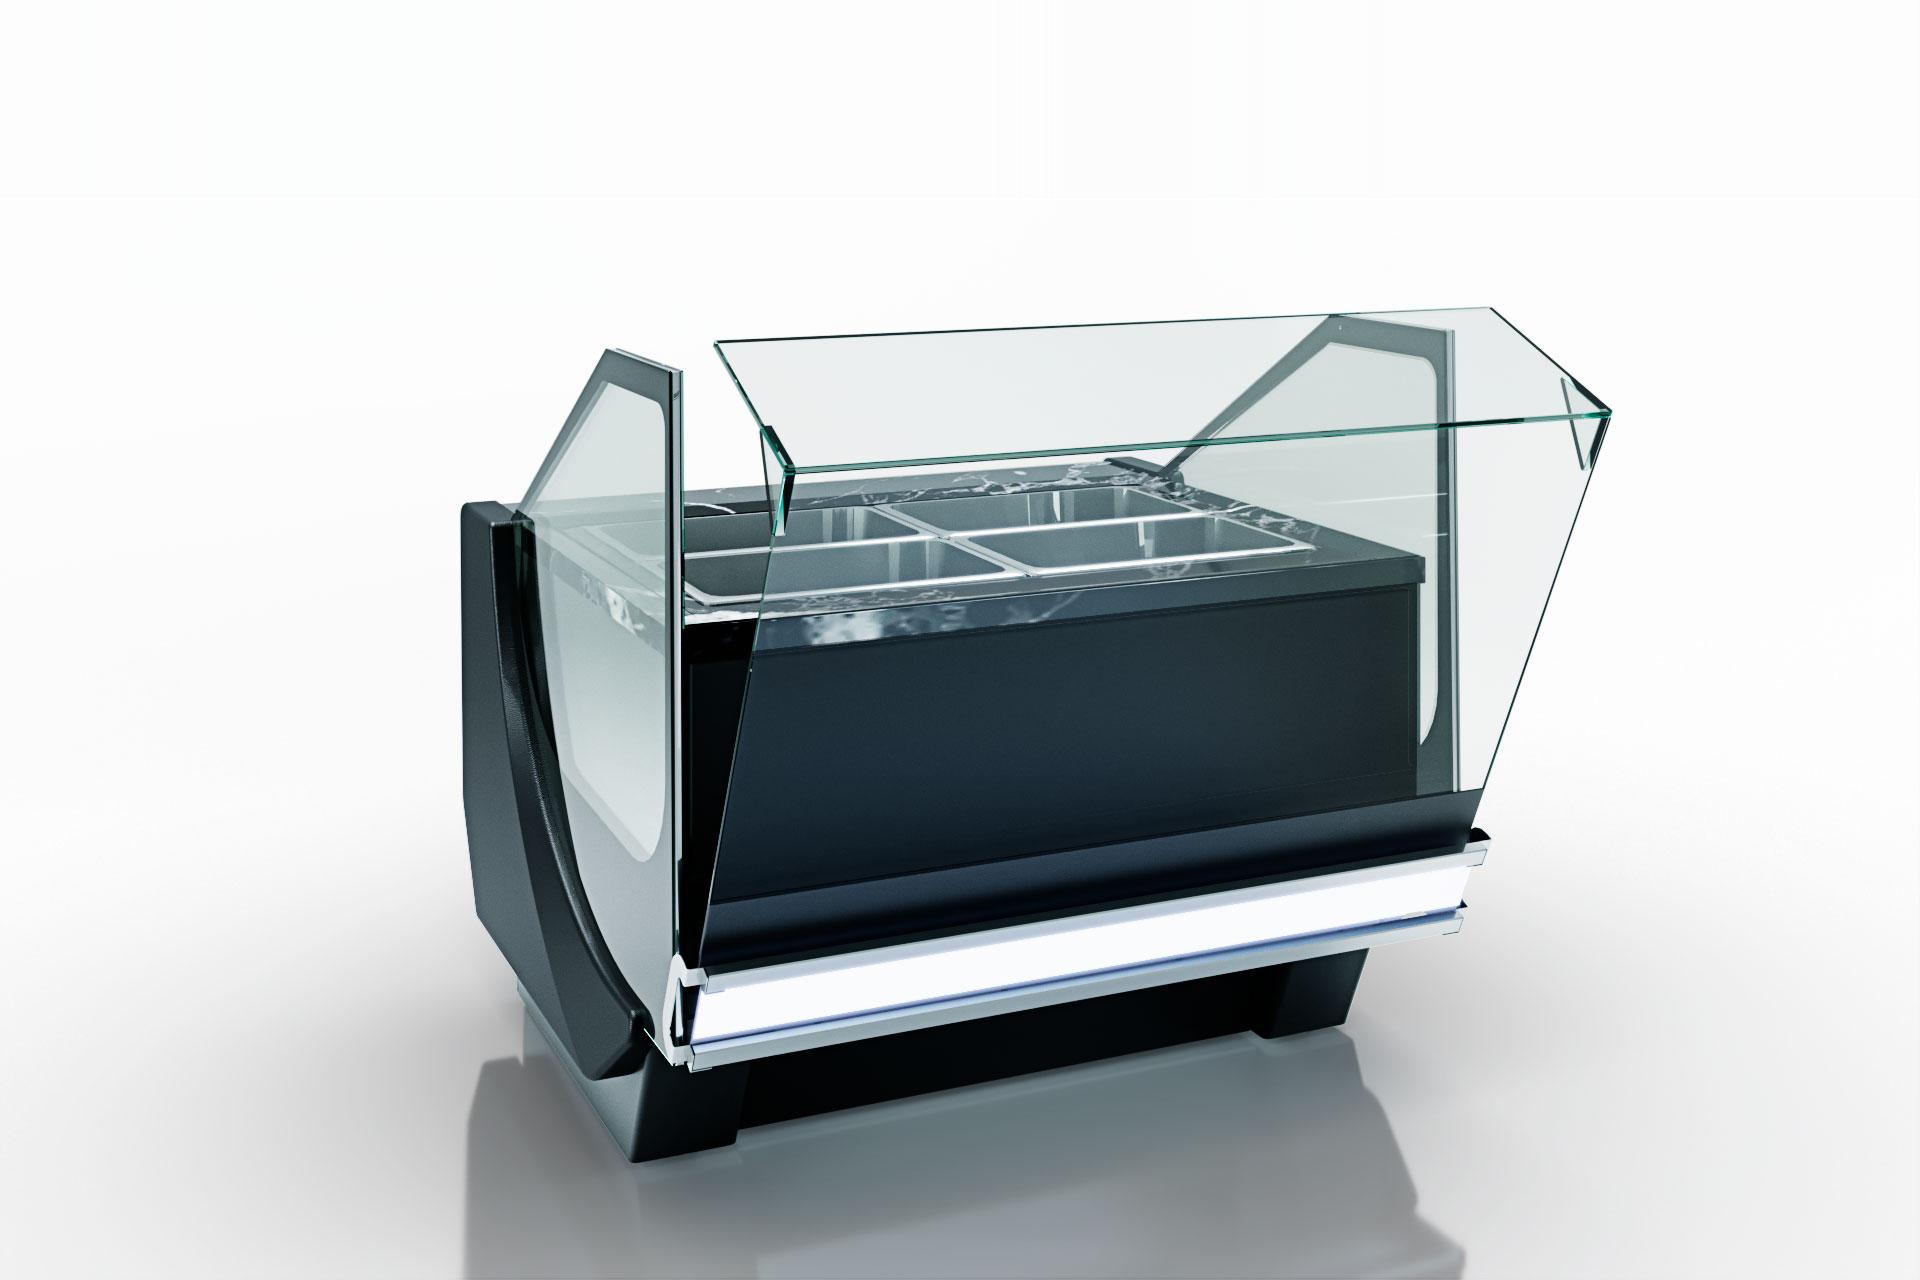 Counters Missouri cold diamond MC 115 pickles OS 121-SLM/SLA